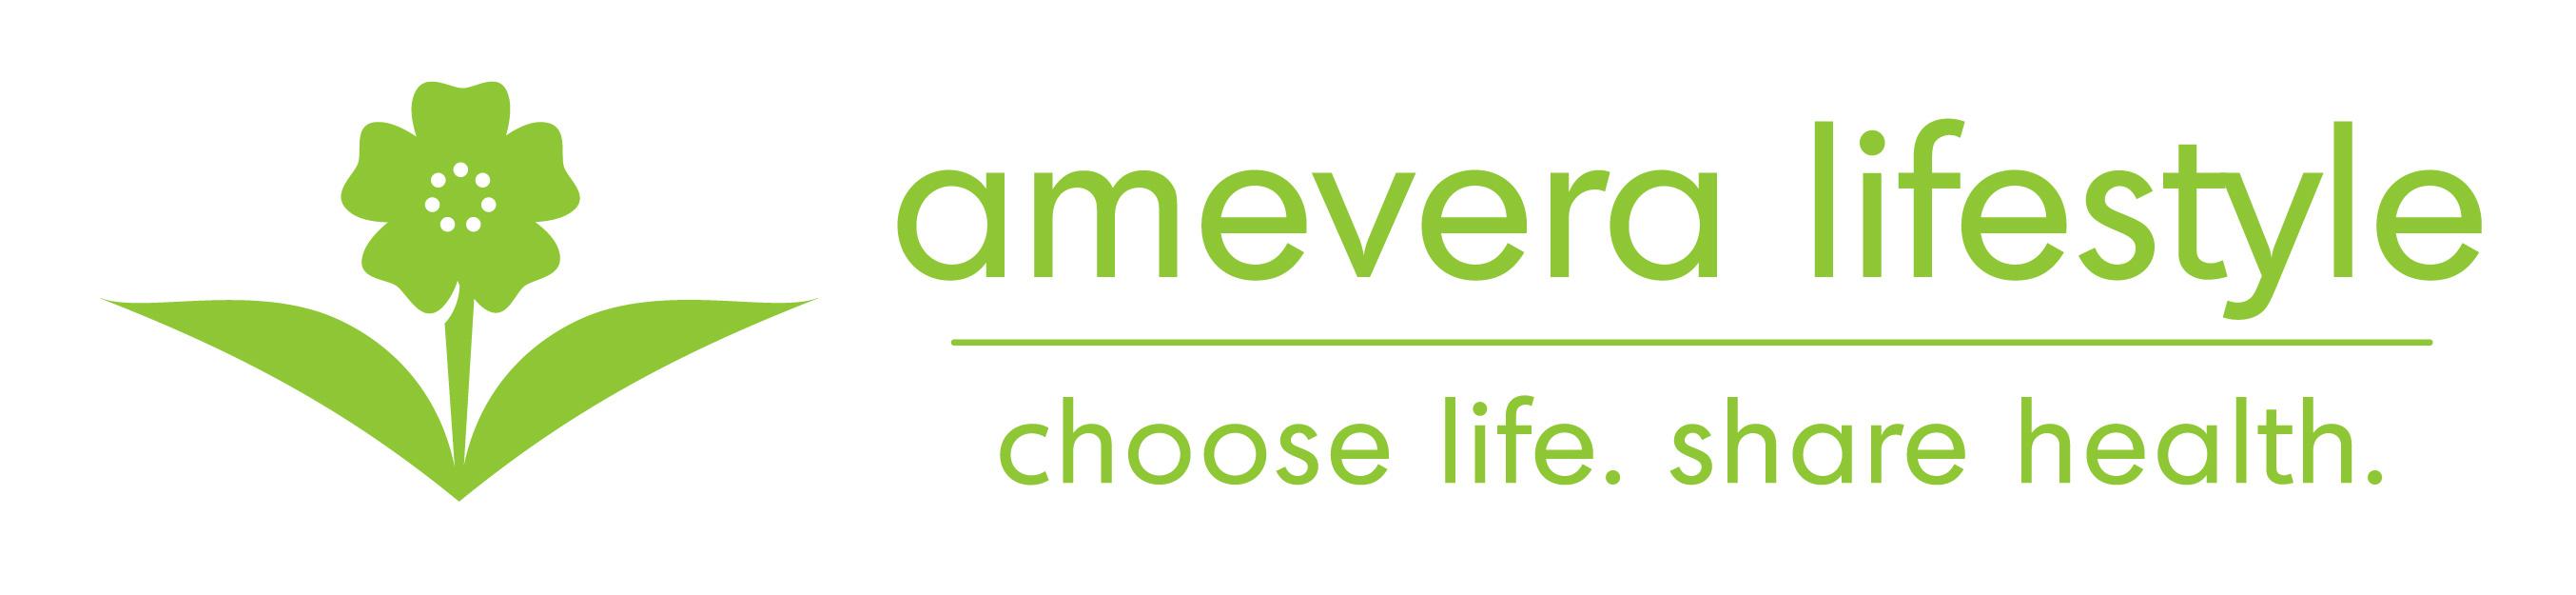 amevera lifestyle